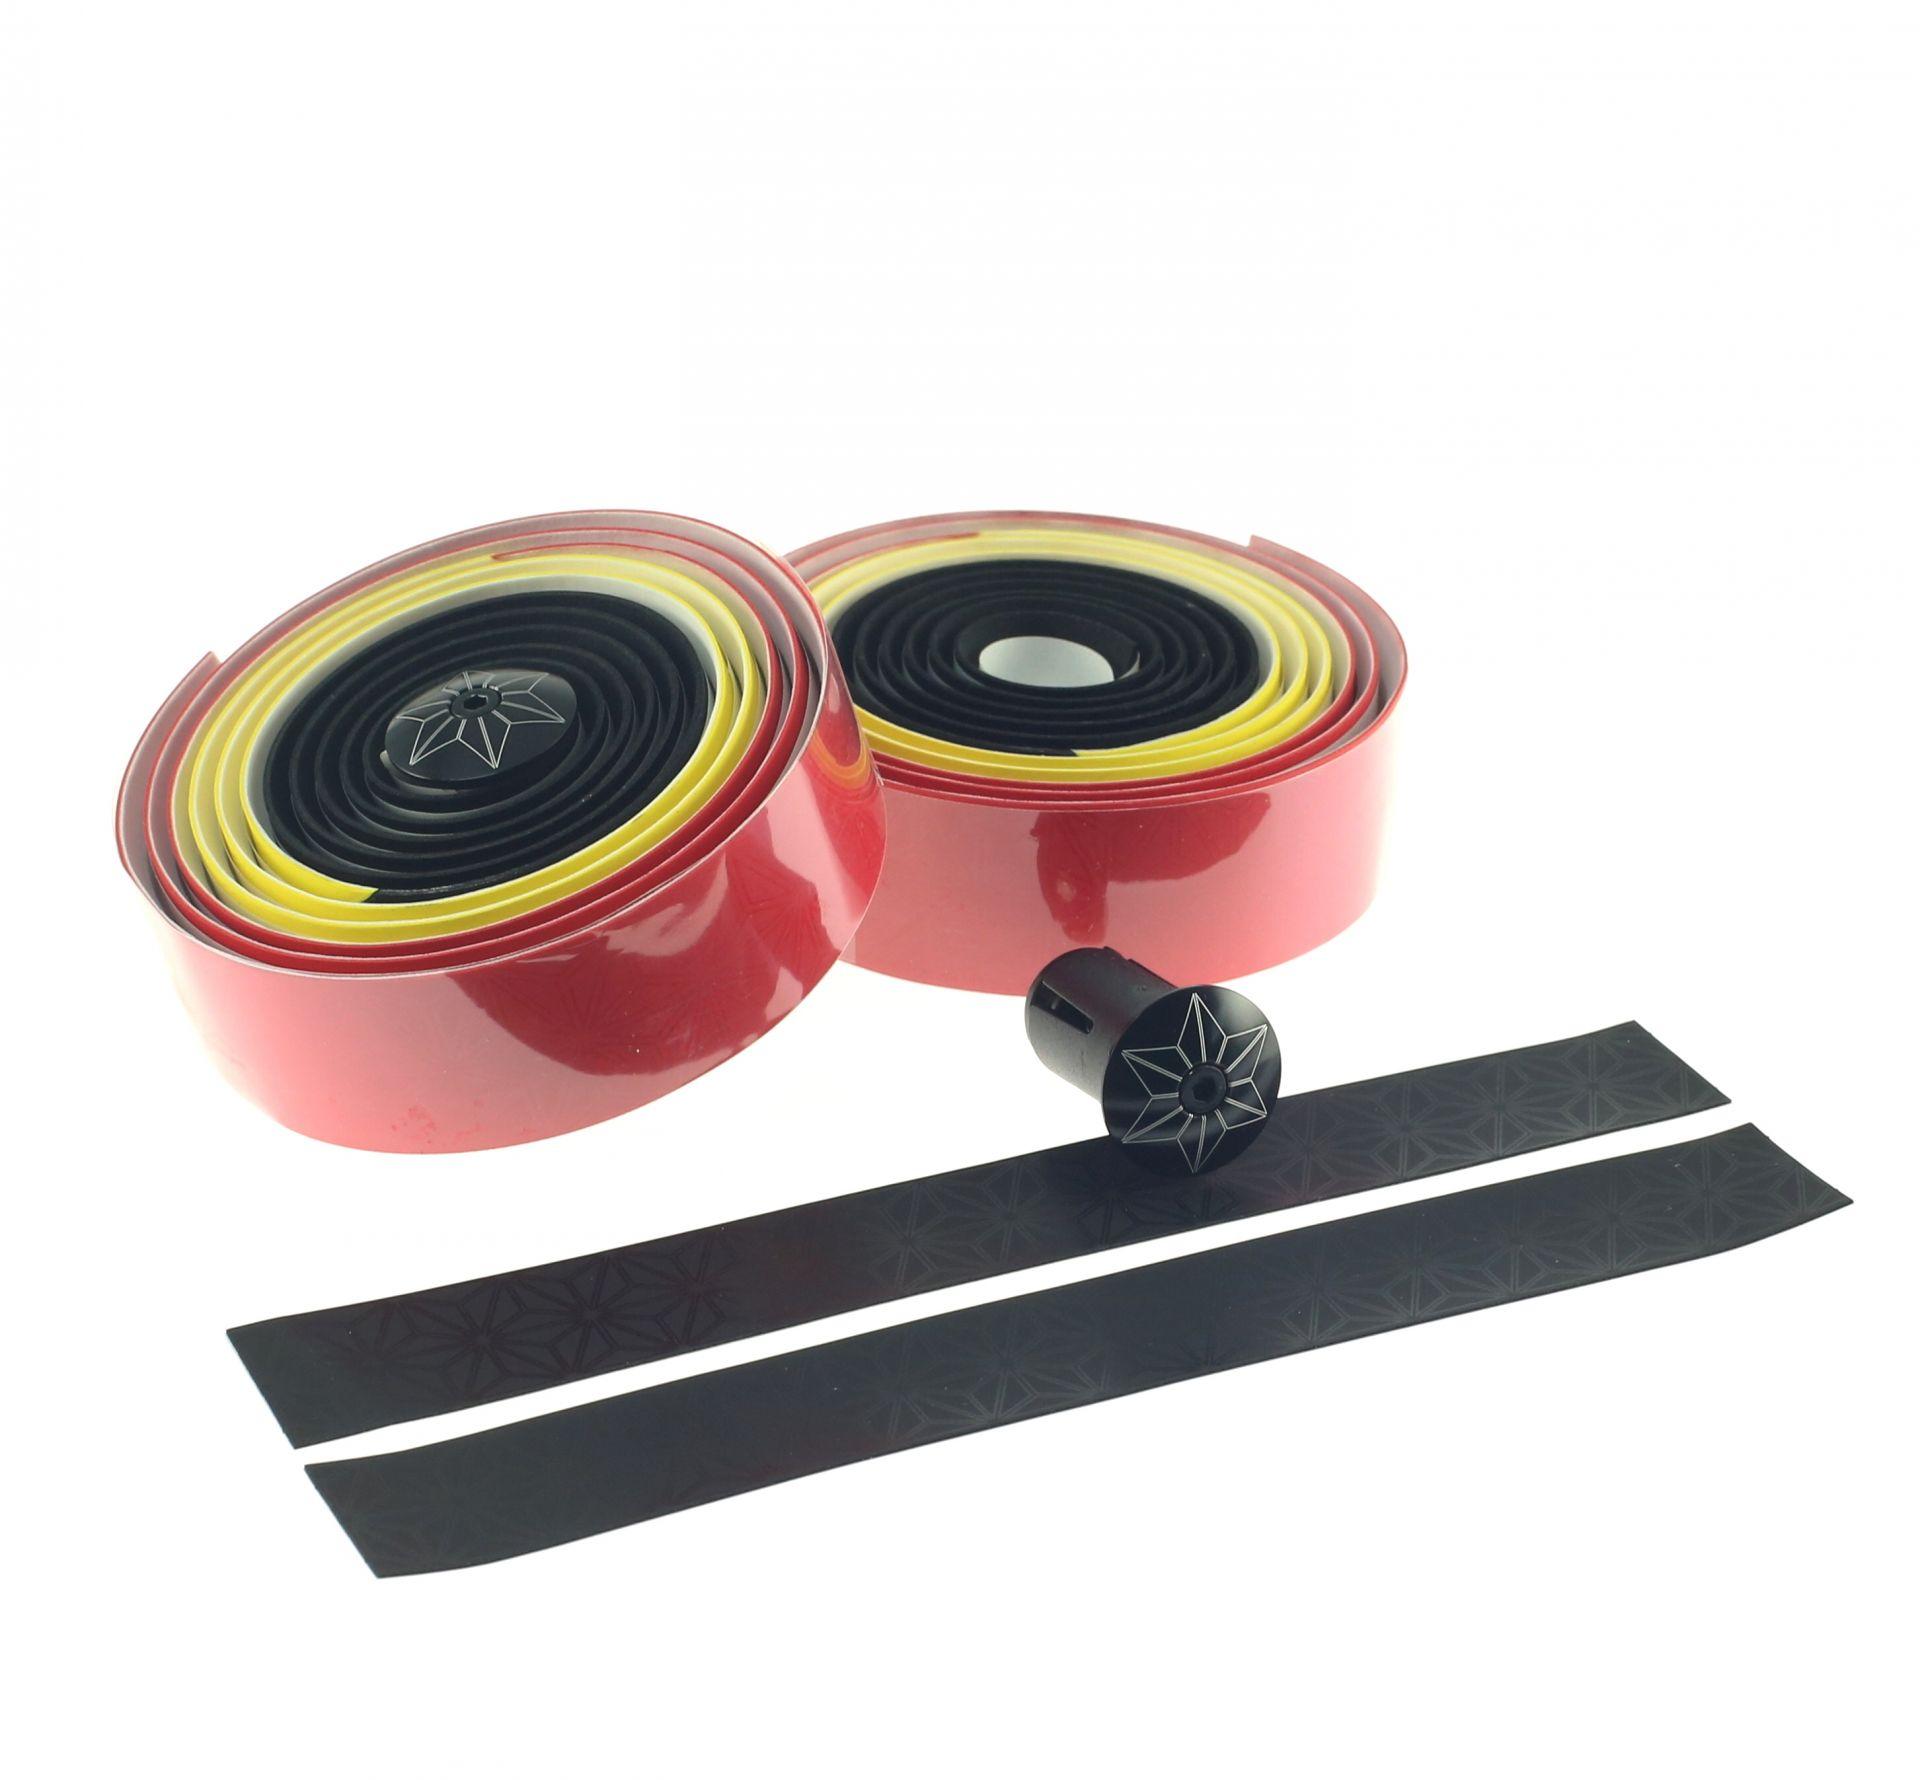 Ruban de cintre Supacaz Super Sticky Kush Tape Belgique